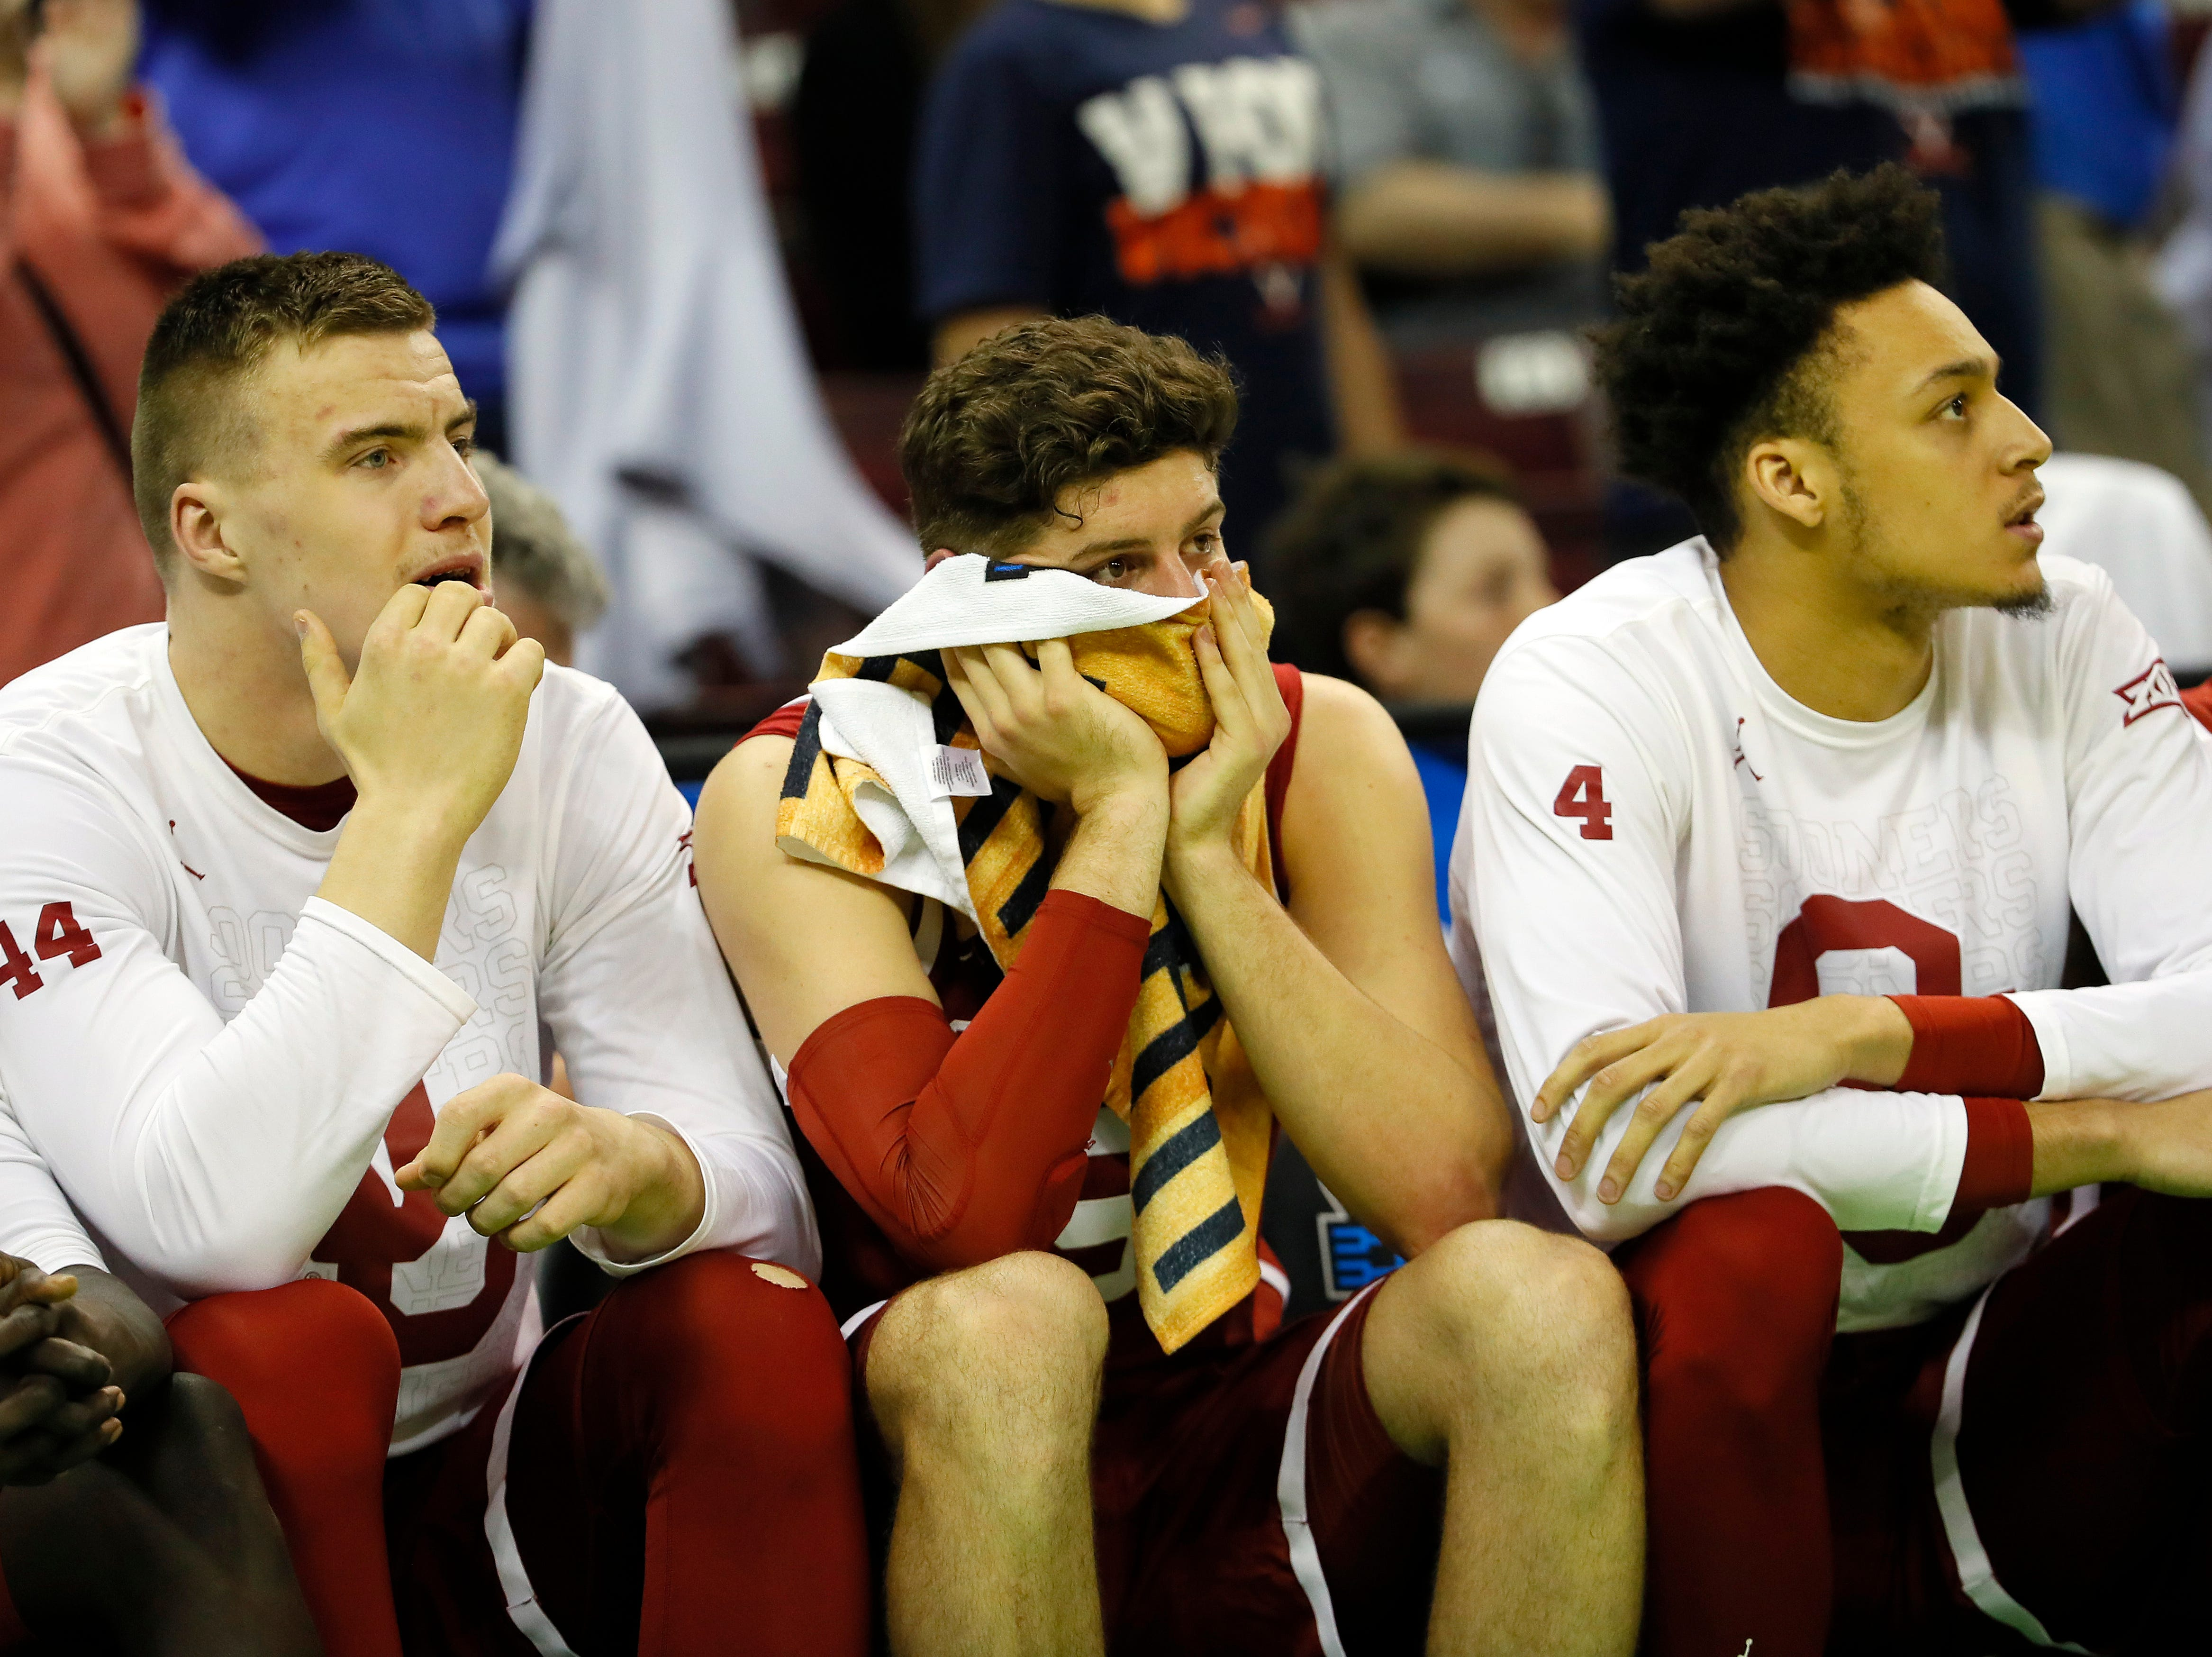 Round of 32: No. 9 Oklahoma loses to No. 1 Virginia, 63-51.